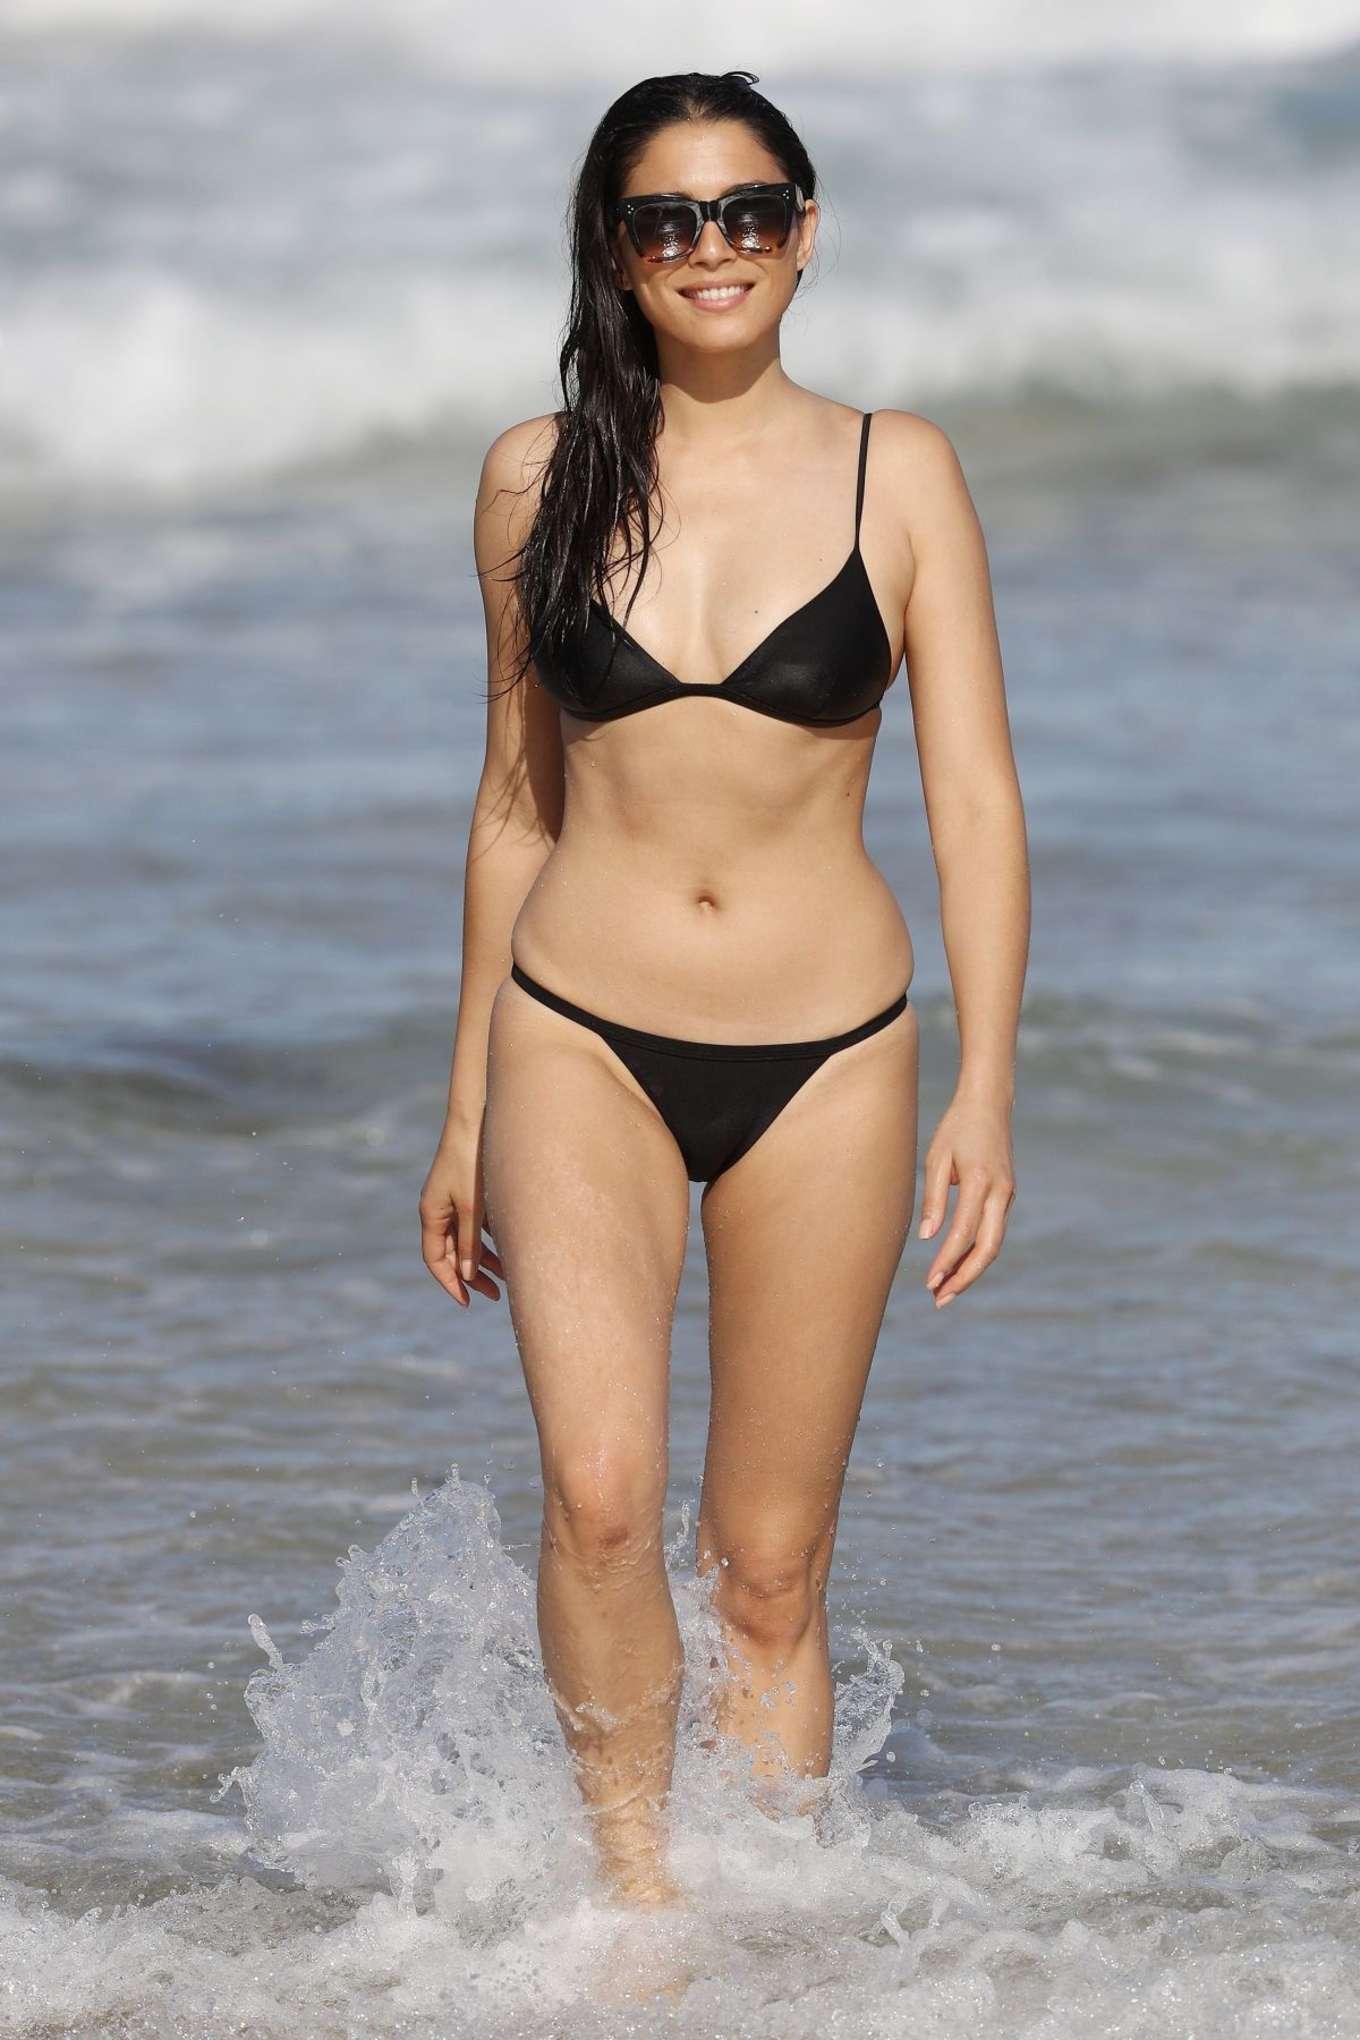 Bikini Jessica Ann nude photos 2019